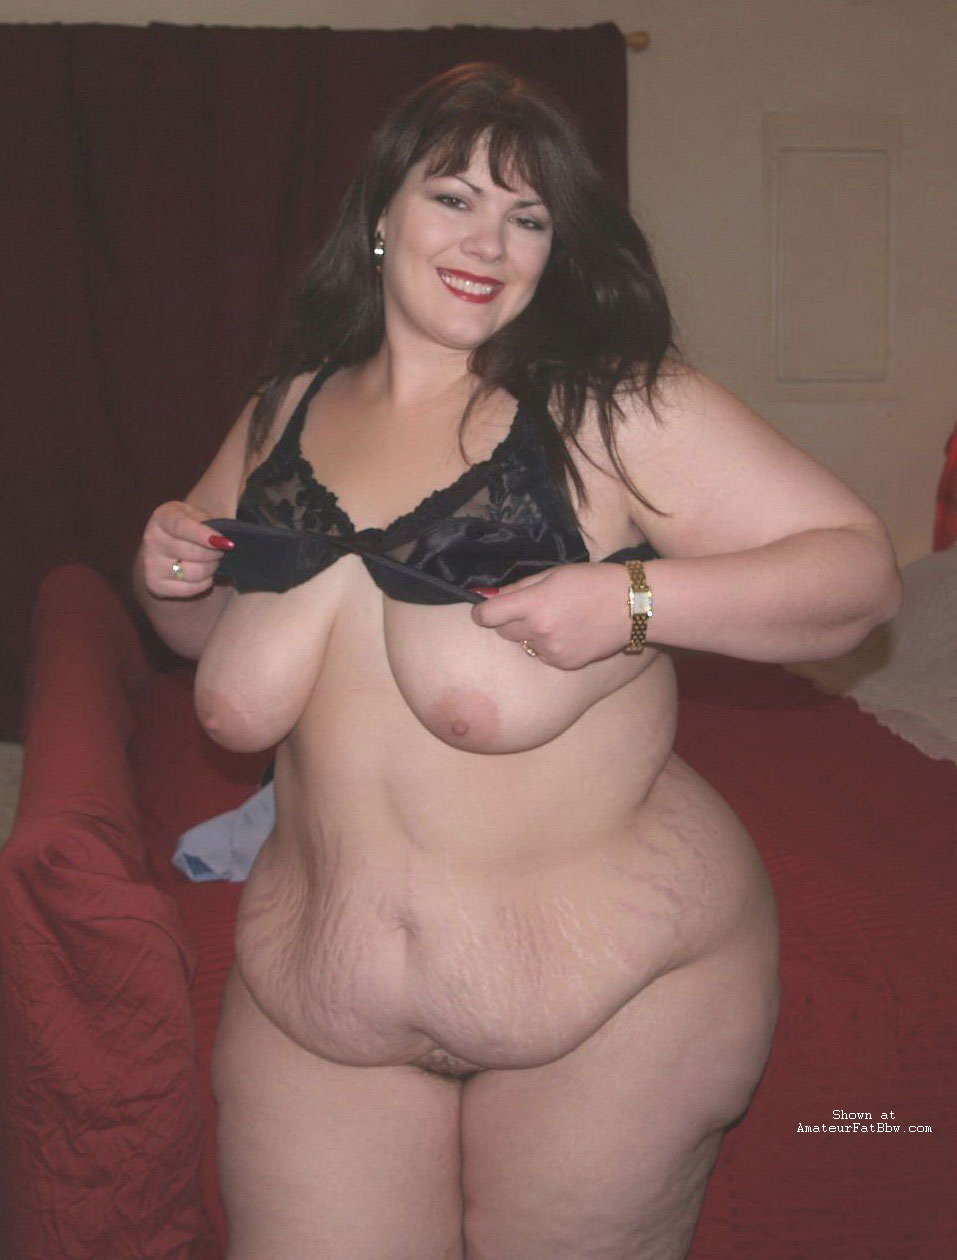 tumblr naked chubby women